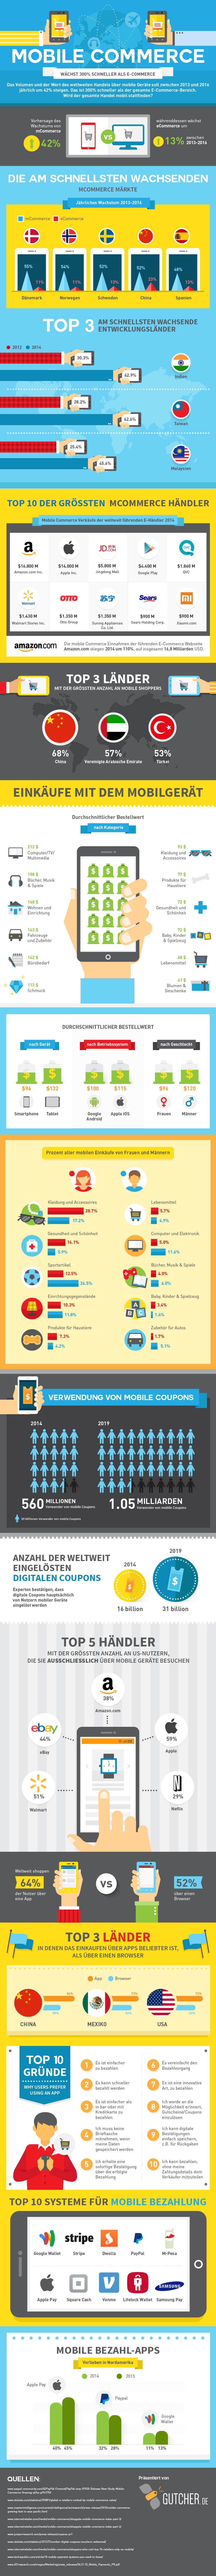 Infografik Online Erfolgreicher mobiler Handel